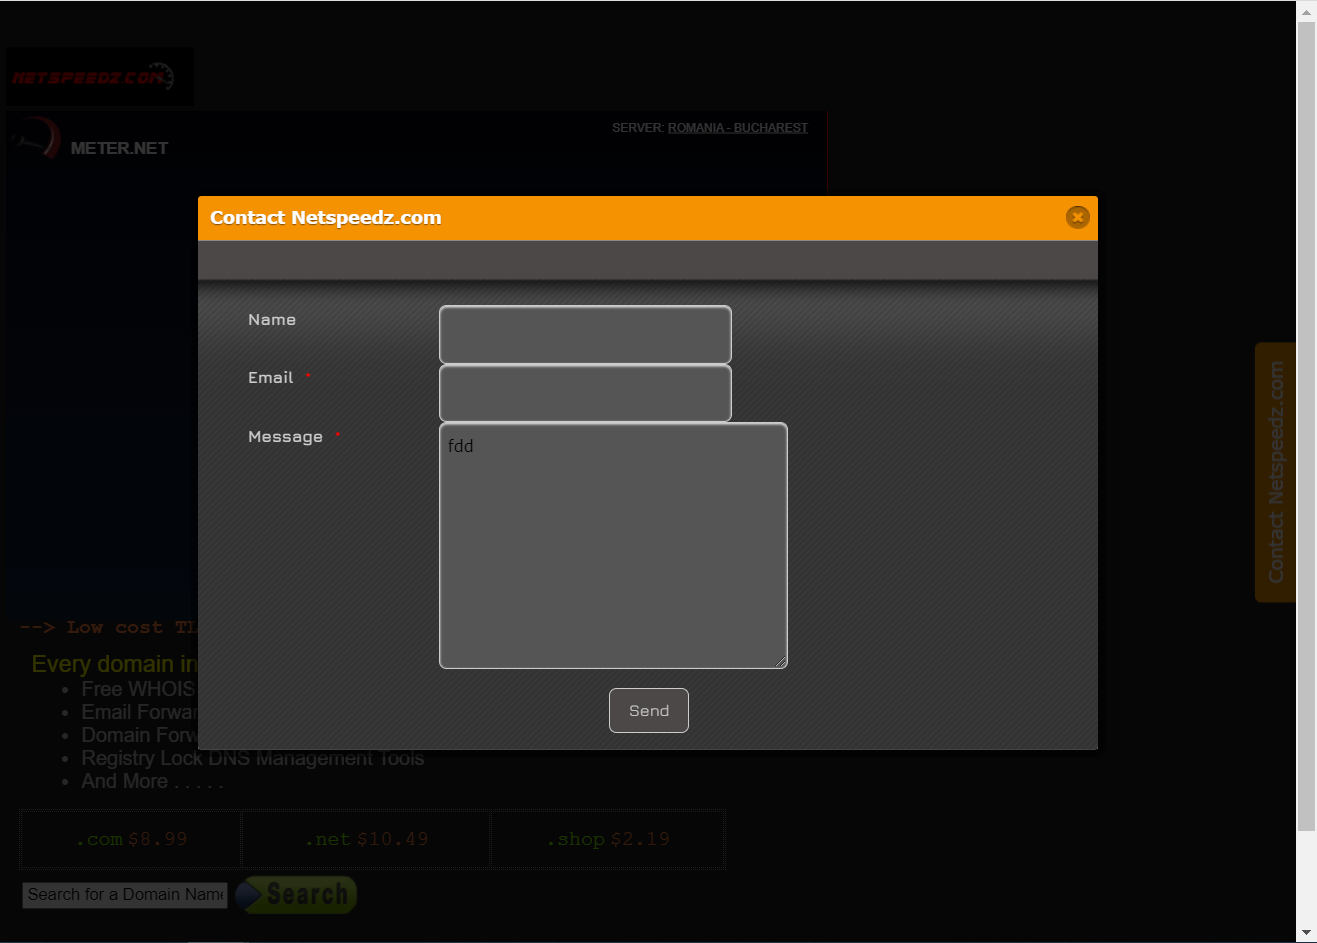 screenshot_5687.png